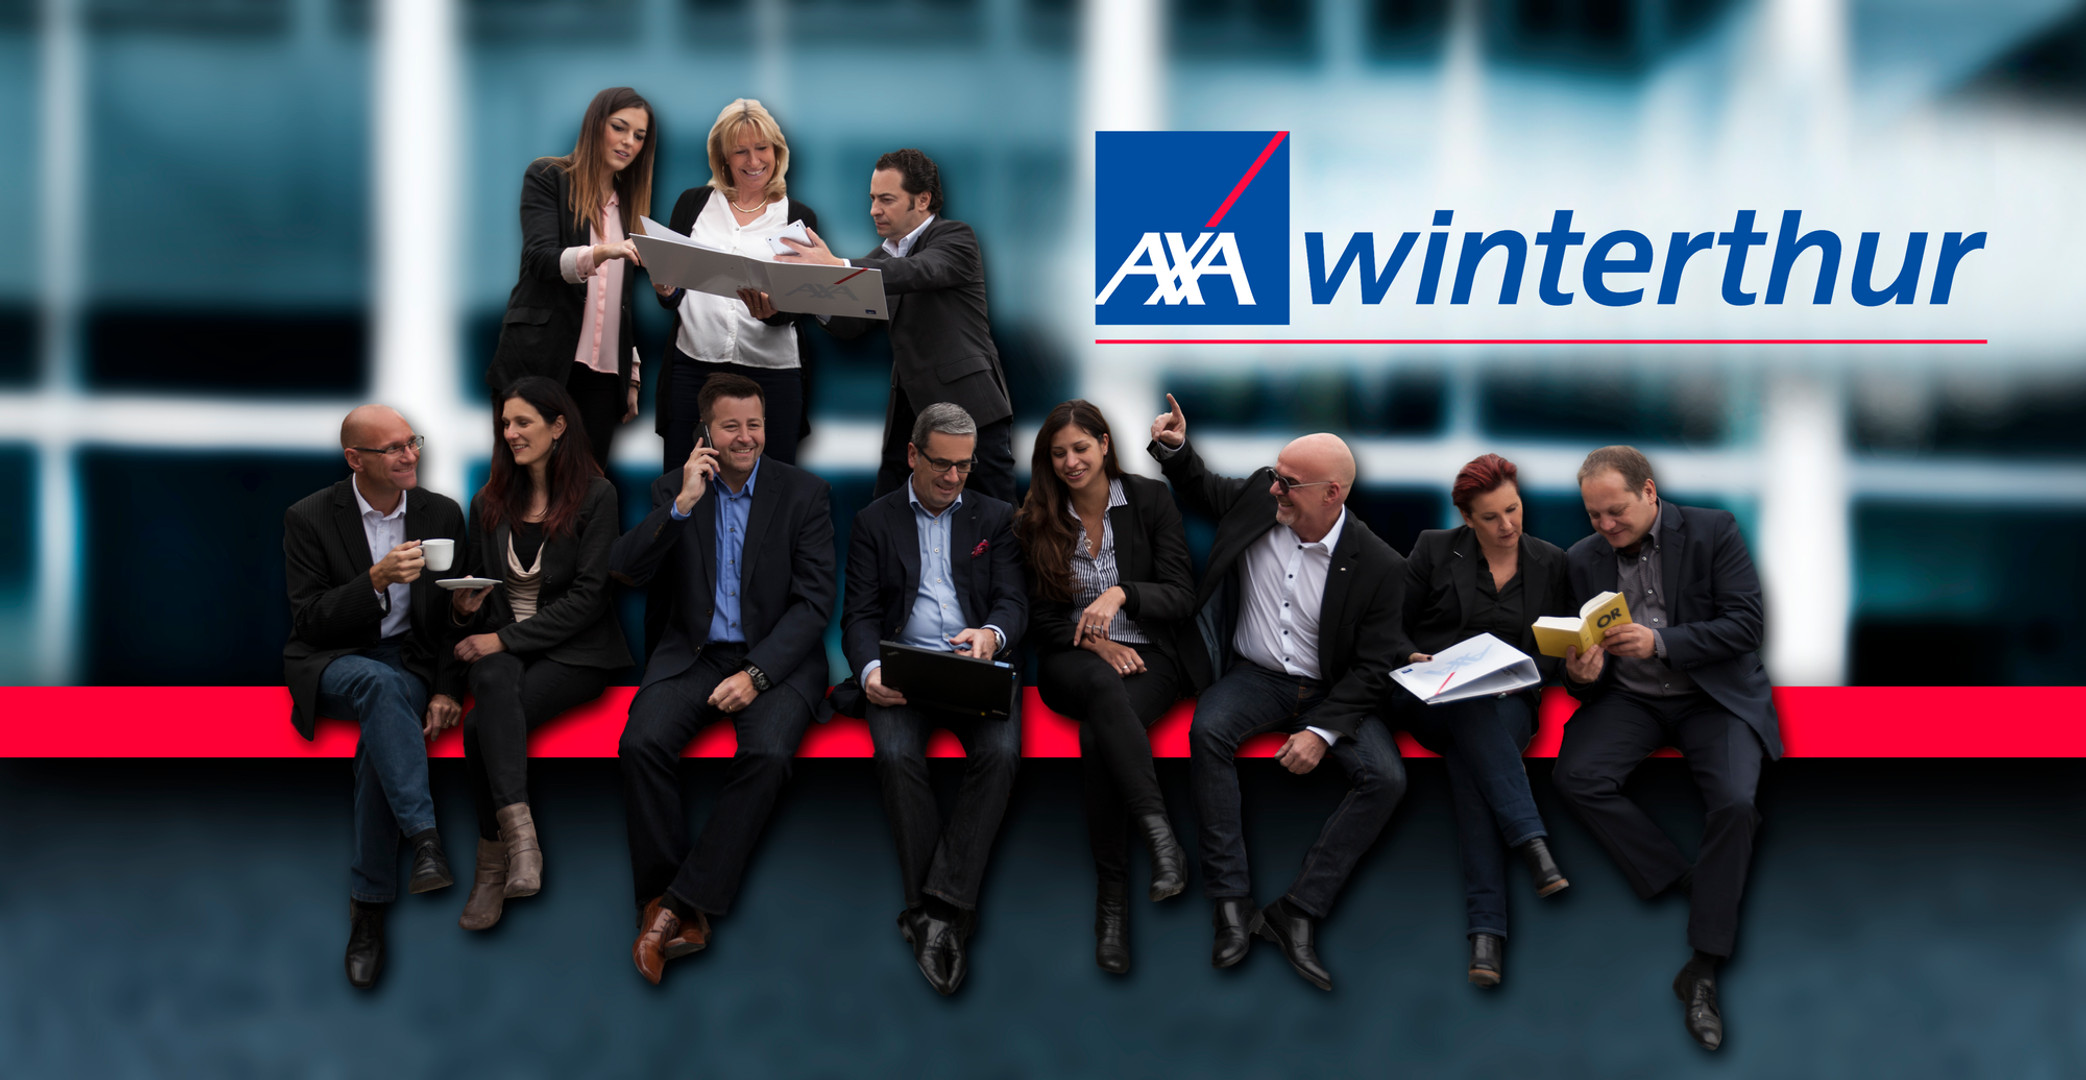 Lustige Mitarbeiterfotos - AXA - Andy Hunger